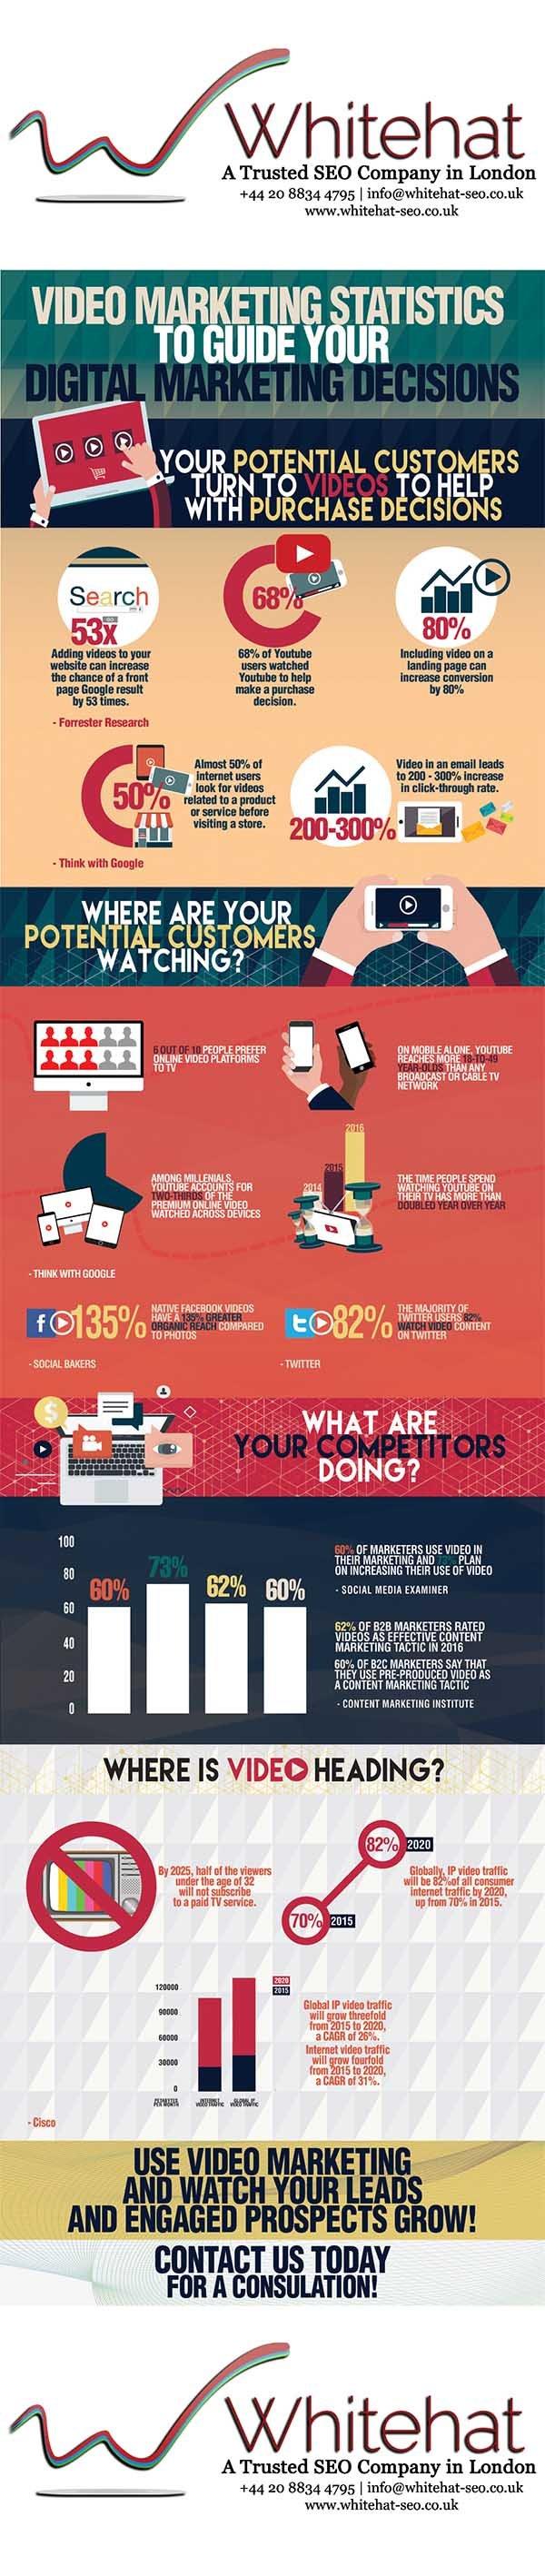 Video Marketing Statistics Guide Digital Marketing Decisions